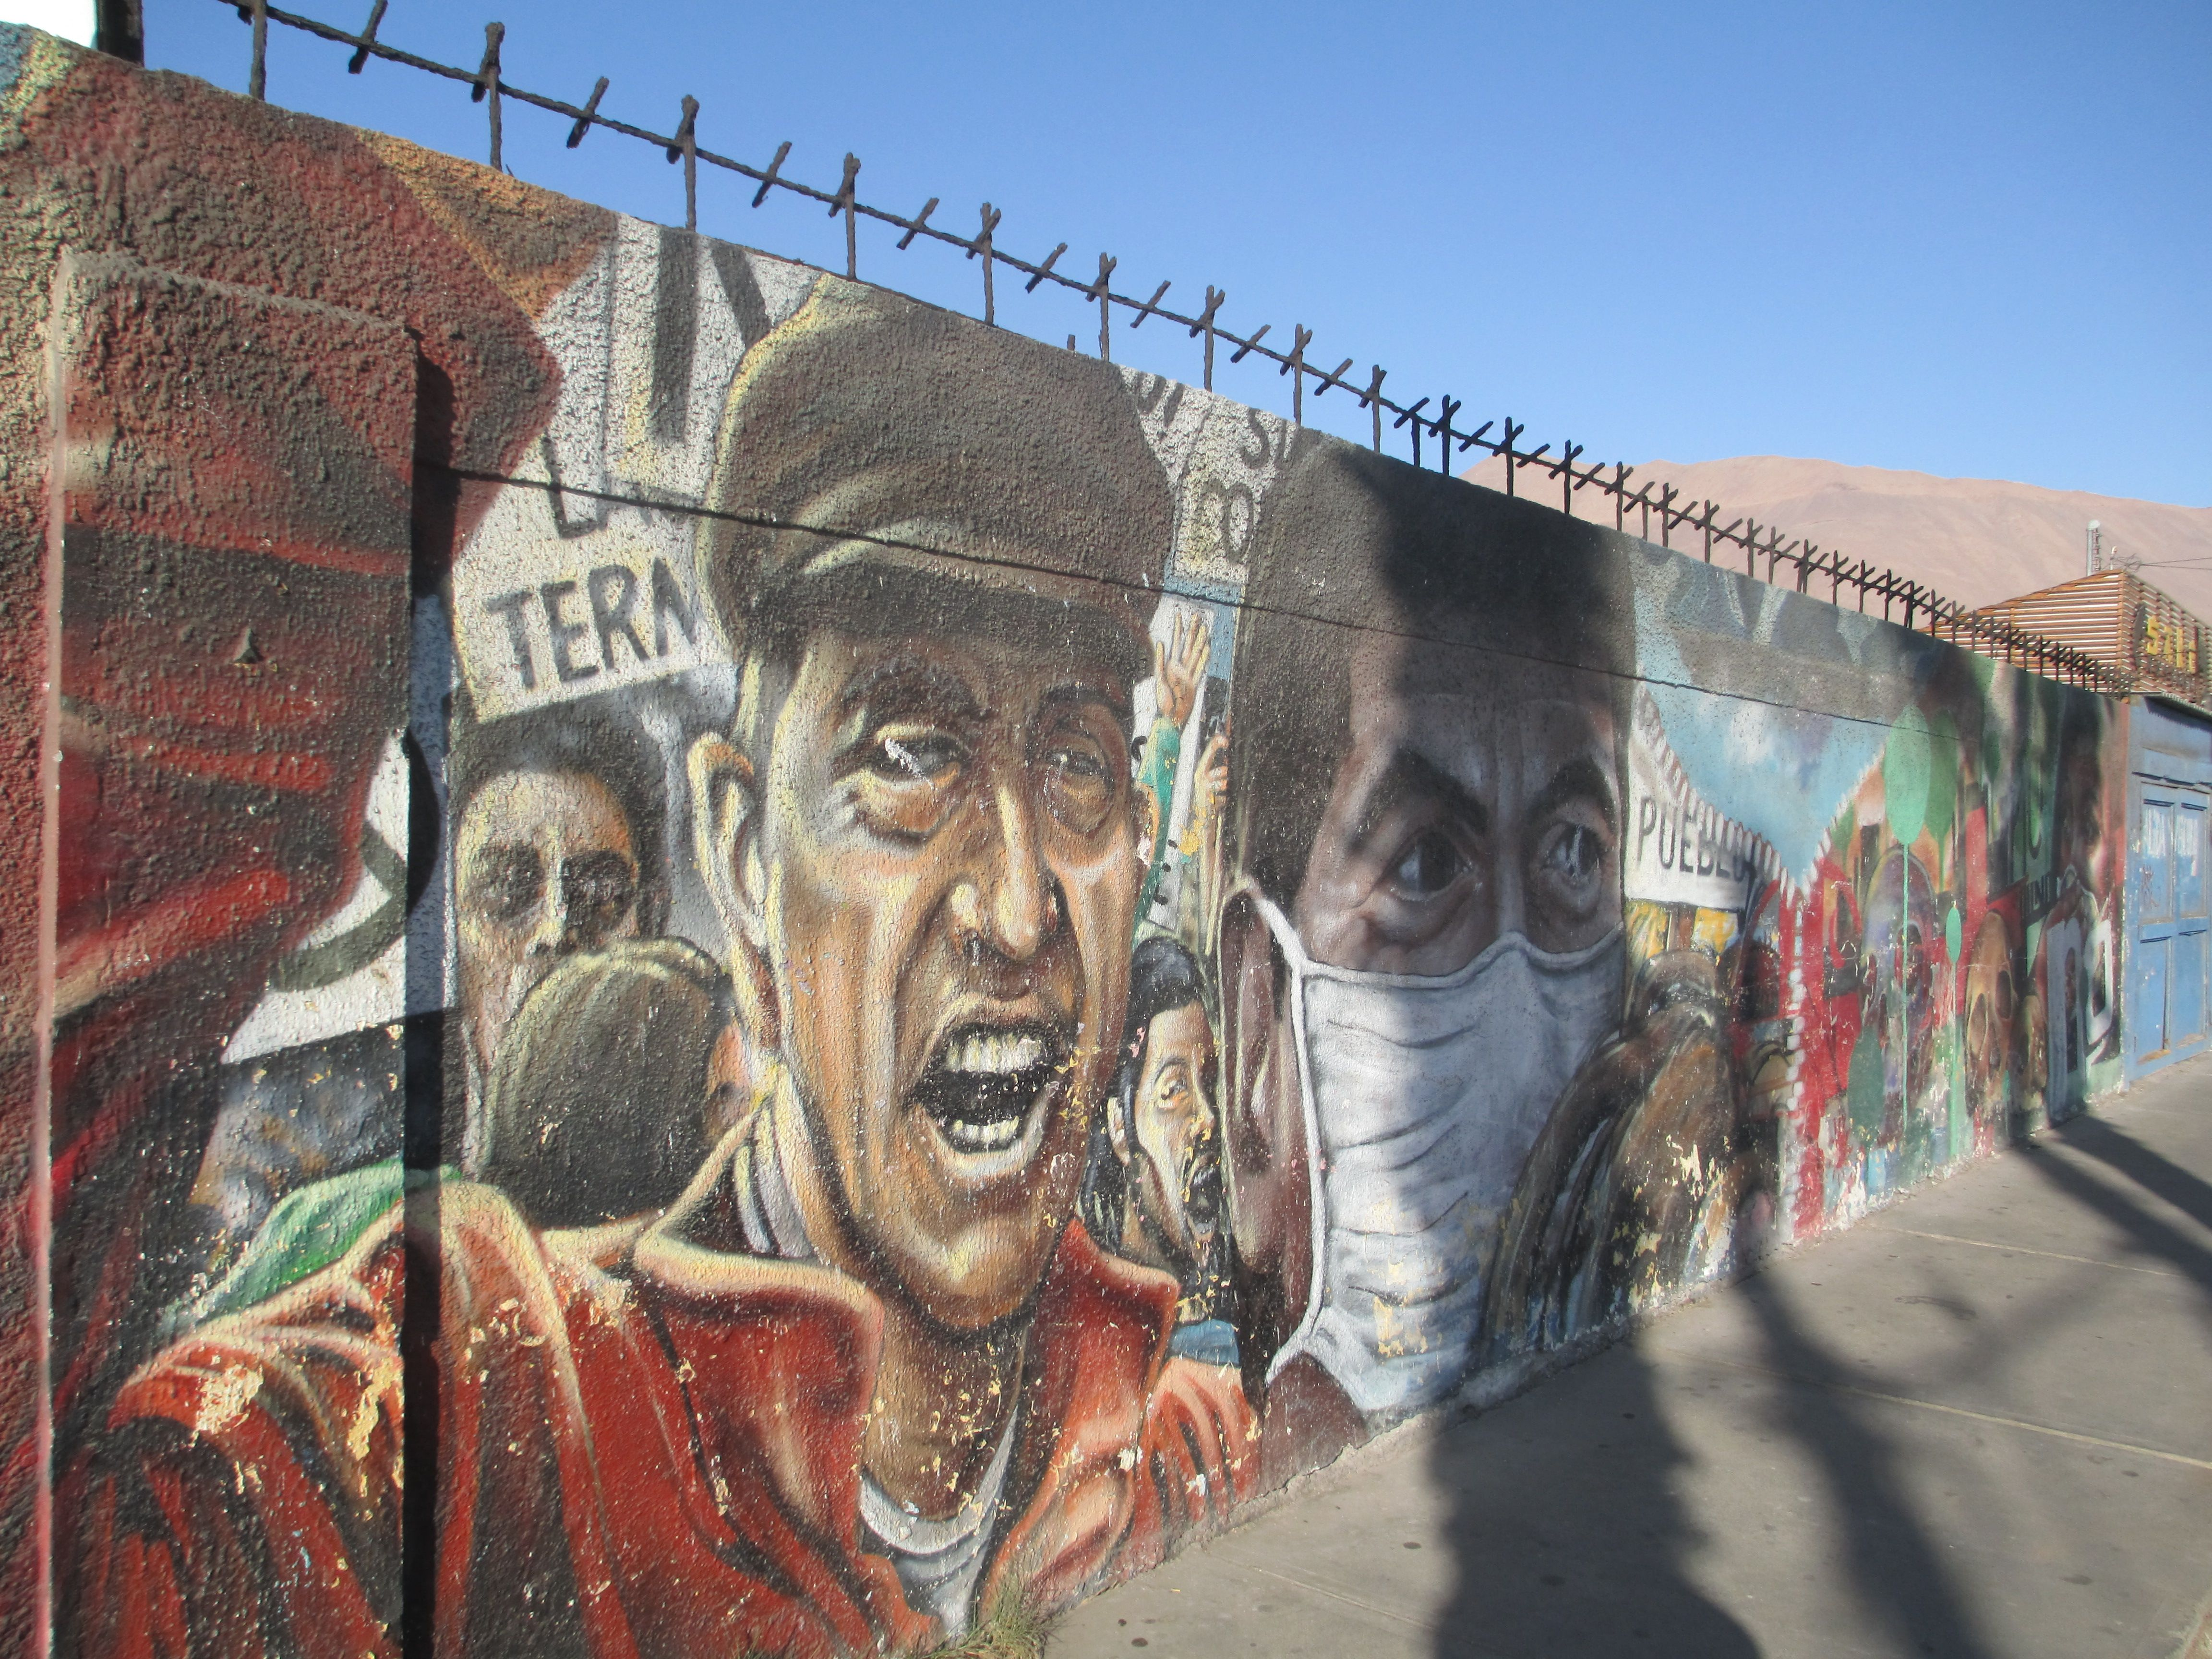 #Arte #Murales #Iquique #Chile Av. Playa Brava